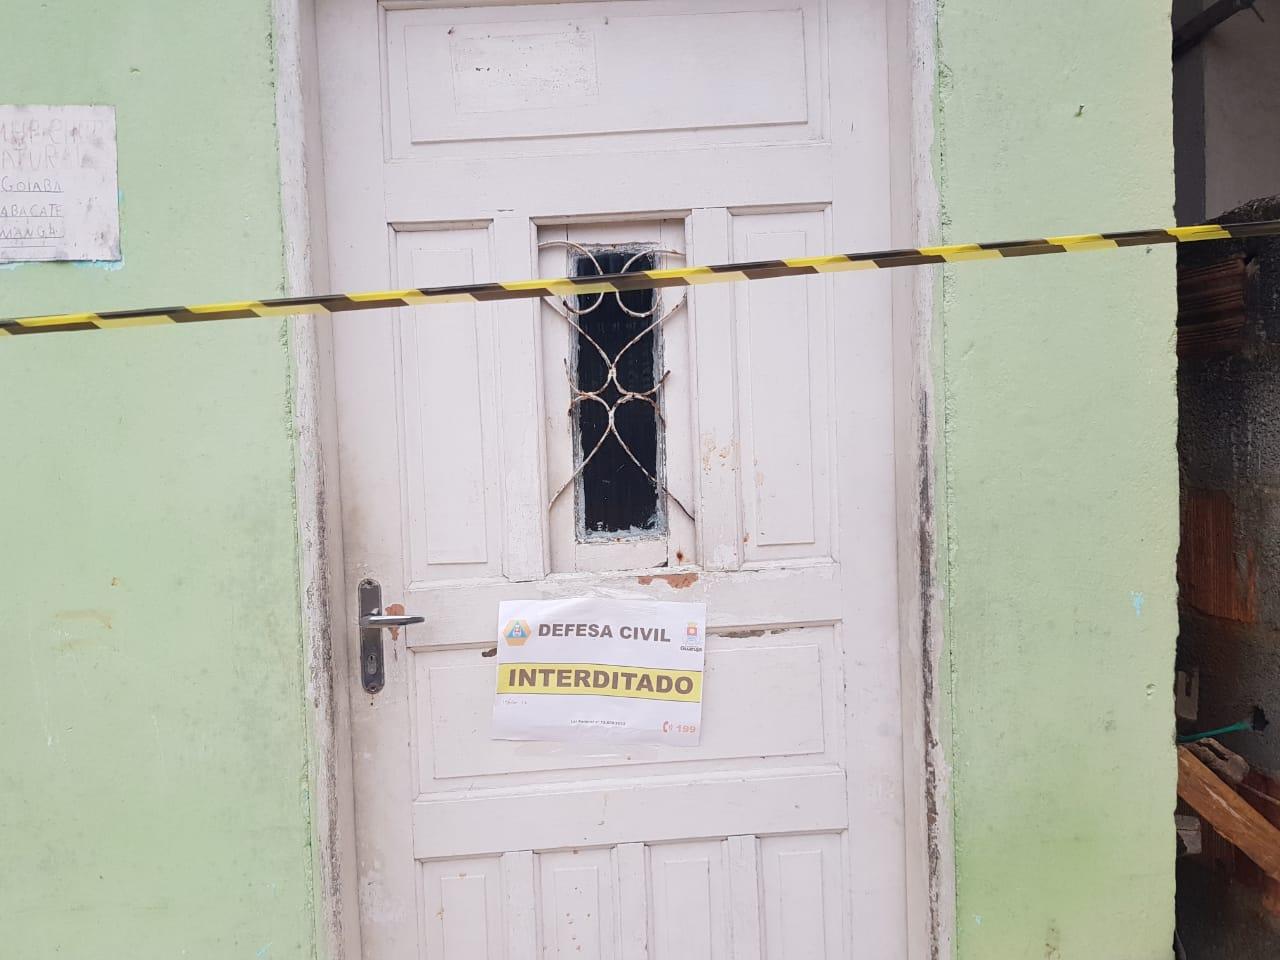 Defesa Civil em Guarujá interdita 477 moradias